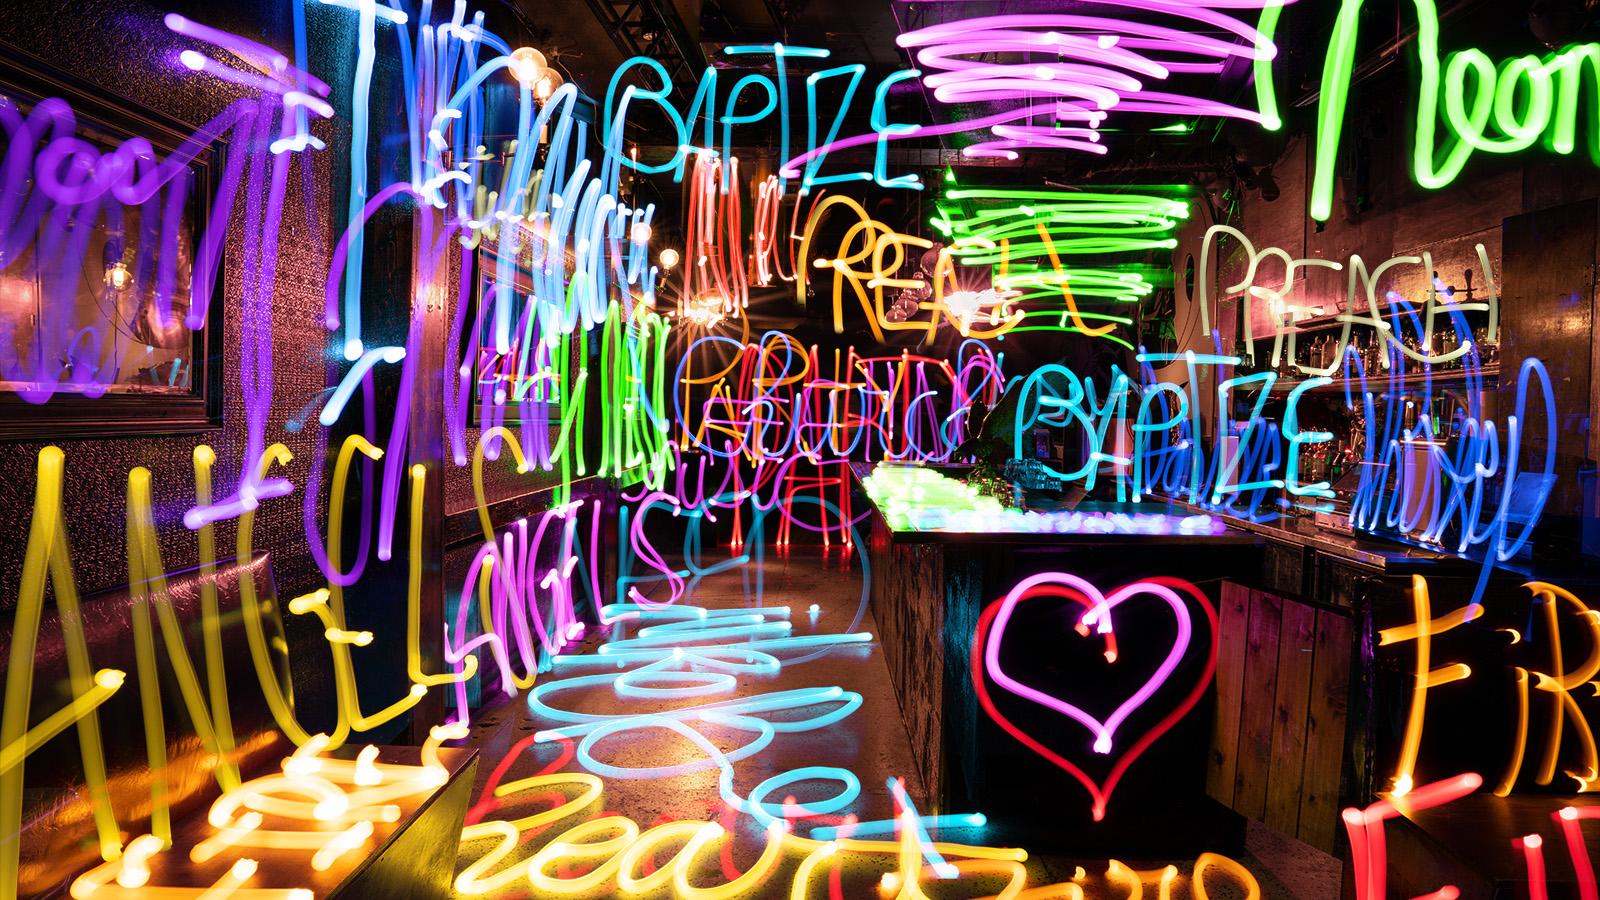 Neon_Church_Patrick_Rochon_CAM1 DSC01226 BAR PANO.jpg